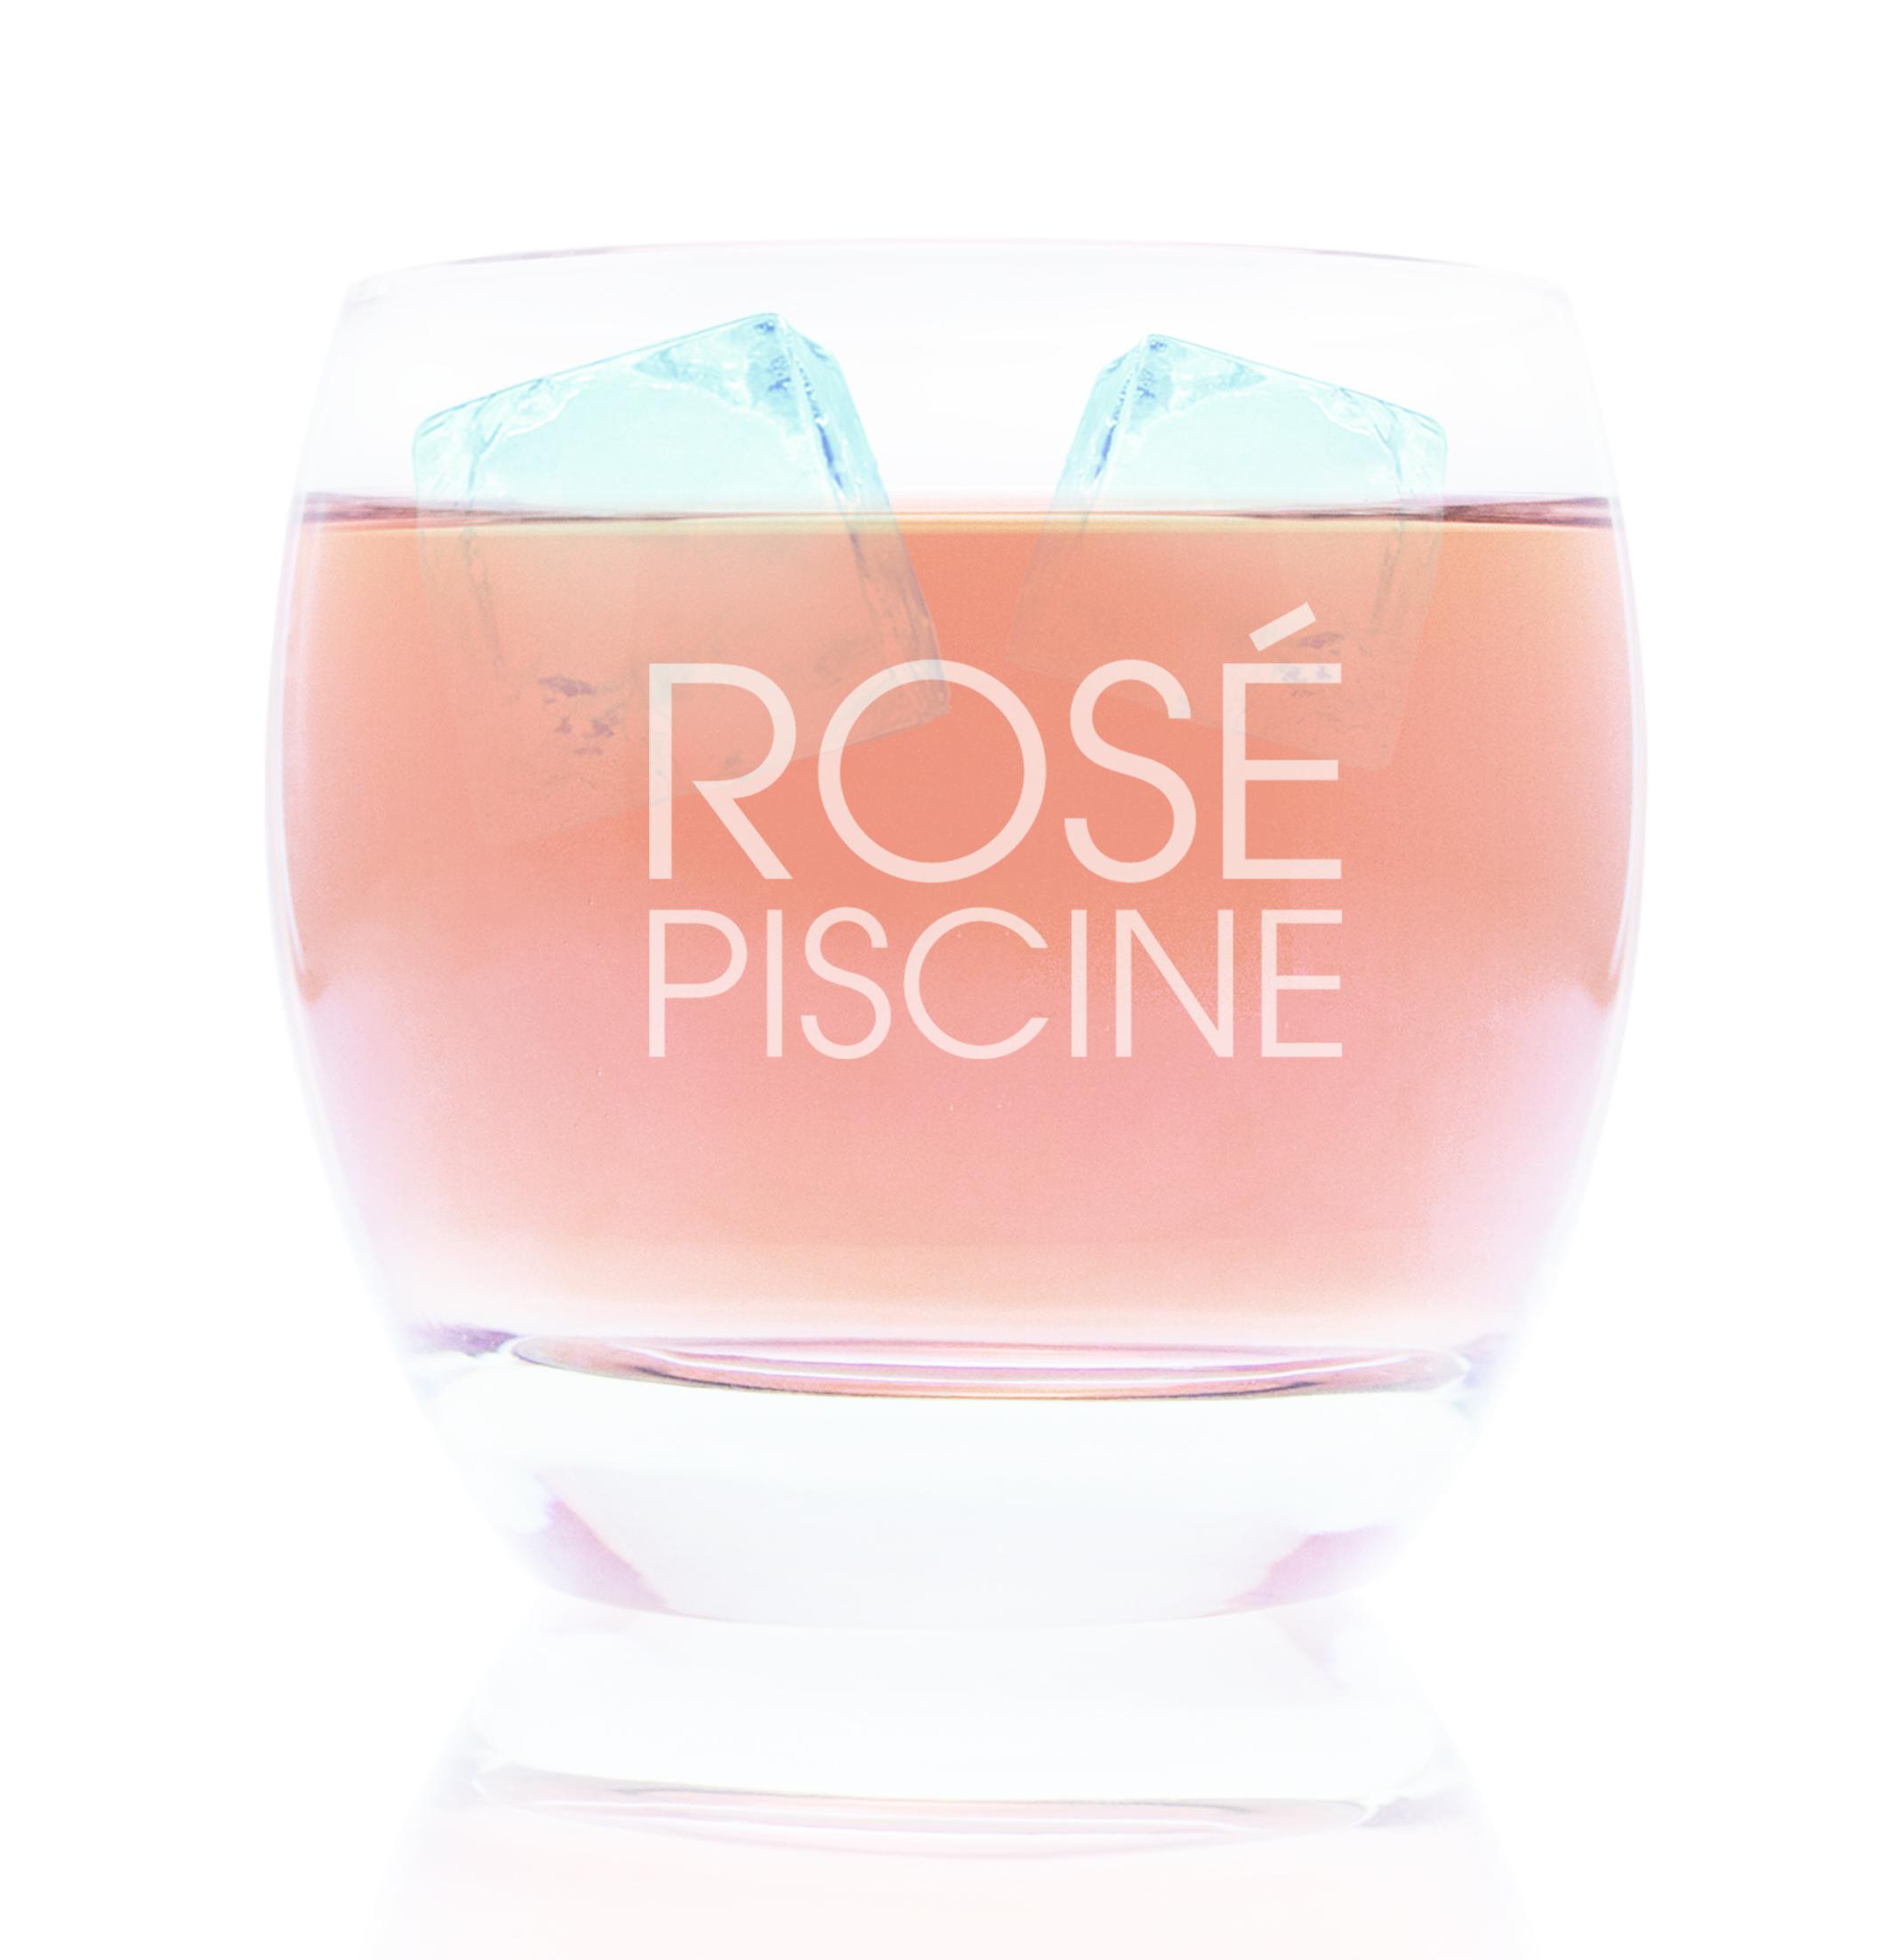 Rosé Piscine Glassware (Box of 6)